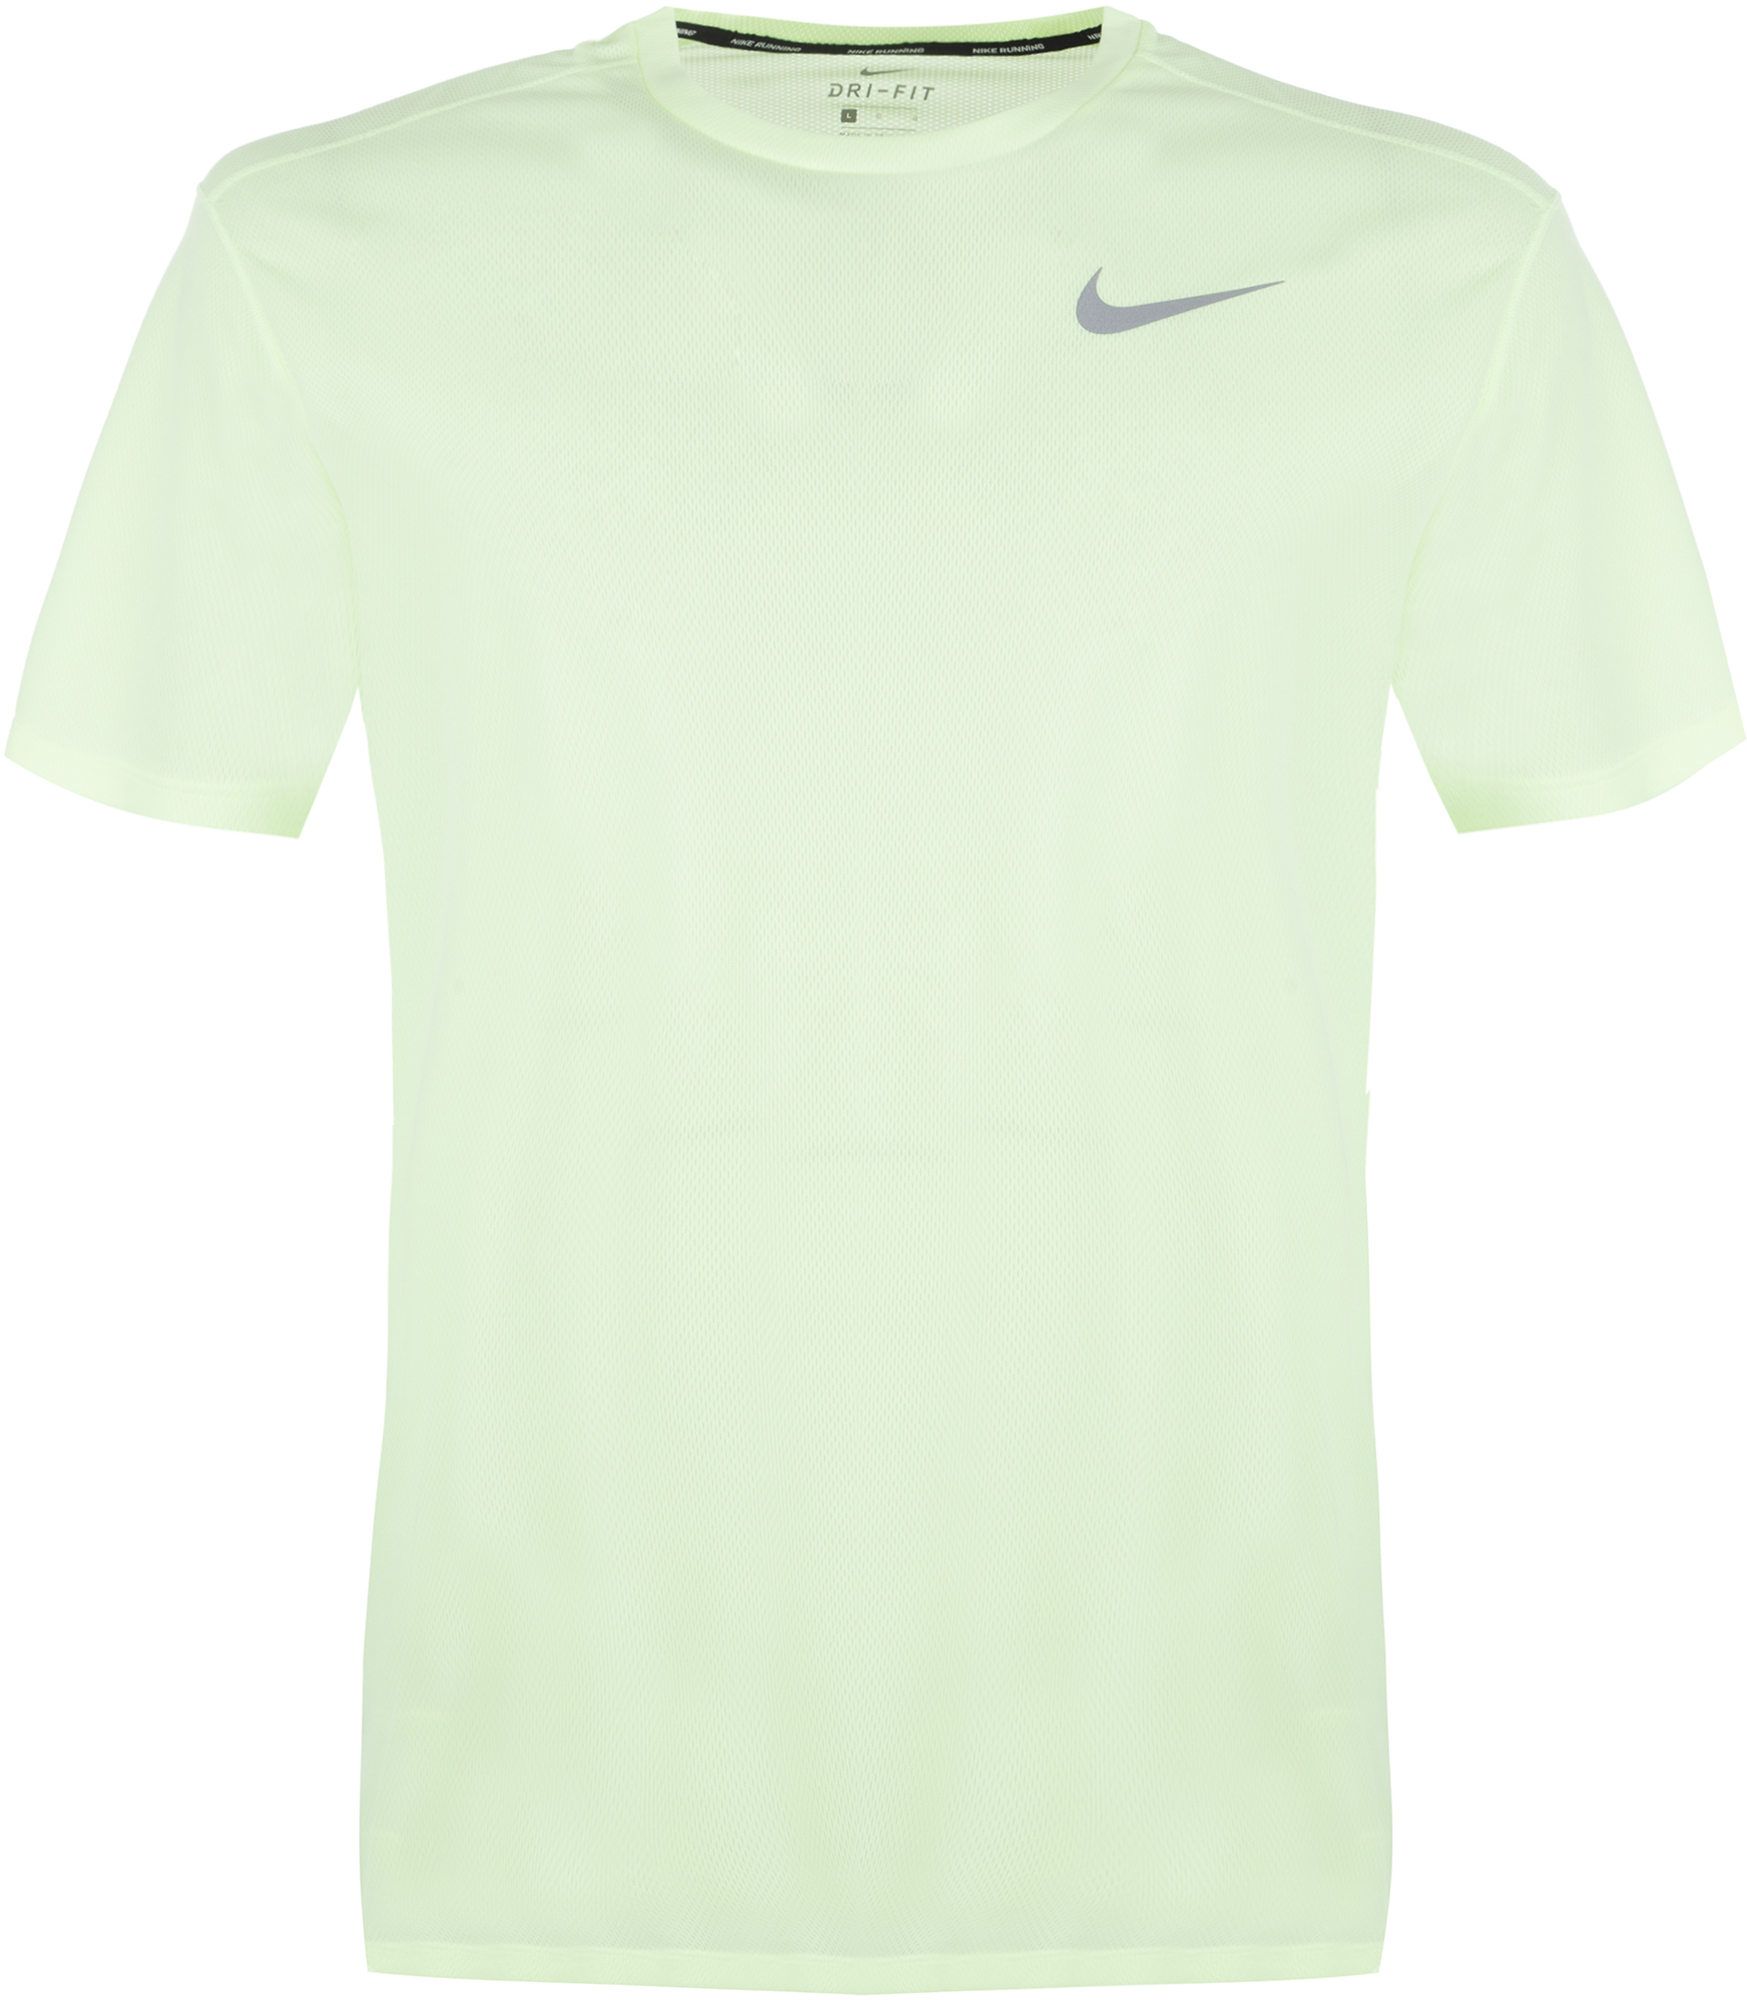 Nike Футболка мужская Nike Breathe Run, размер 52-54 nike футболка мужская nike cool miler